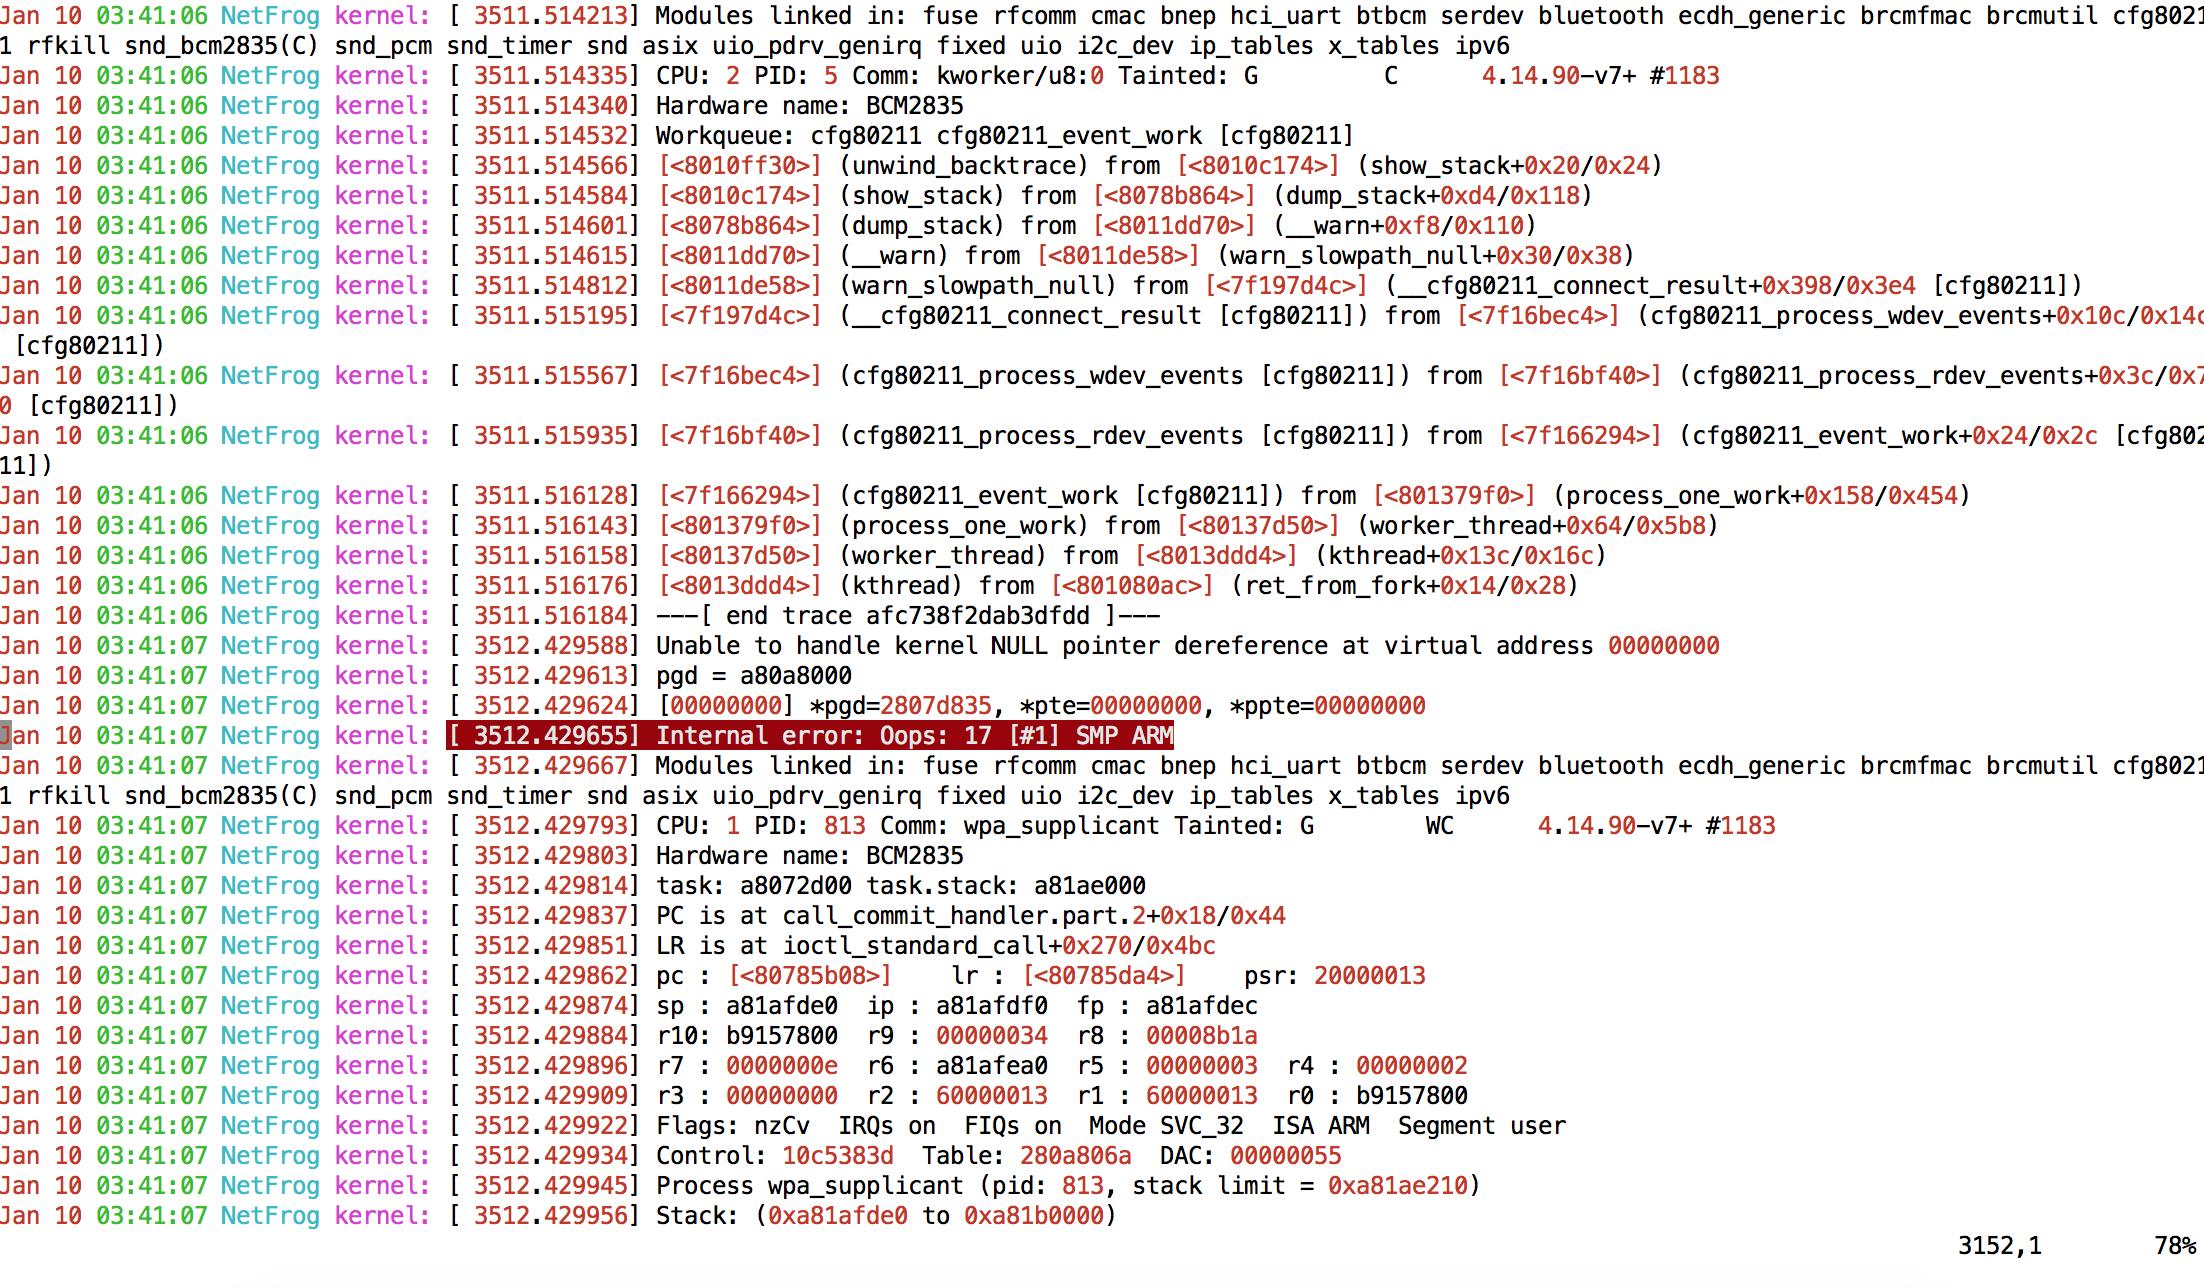 raspberrypi 3b wifi 802 1x benchmark, kernel Internal error